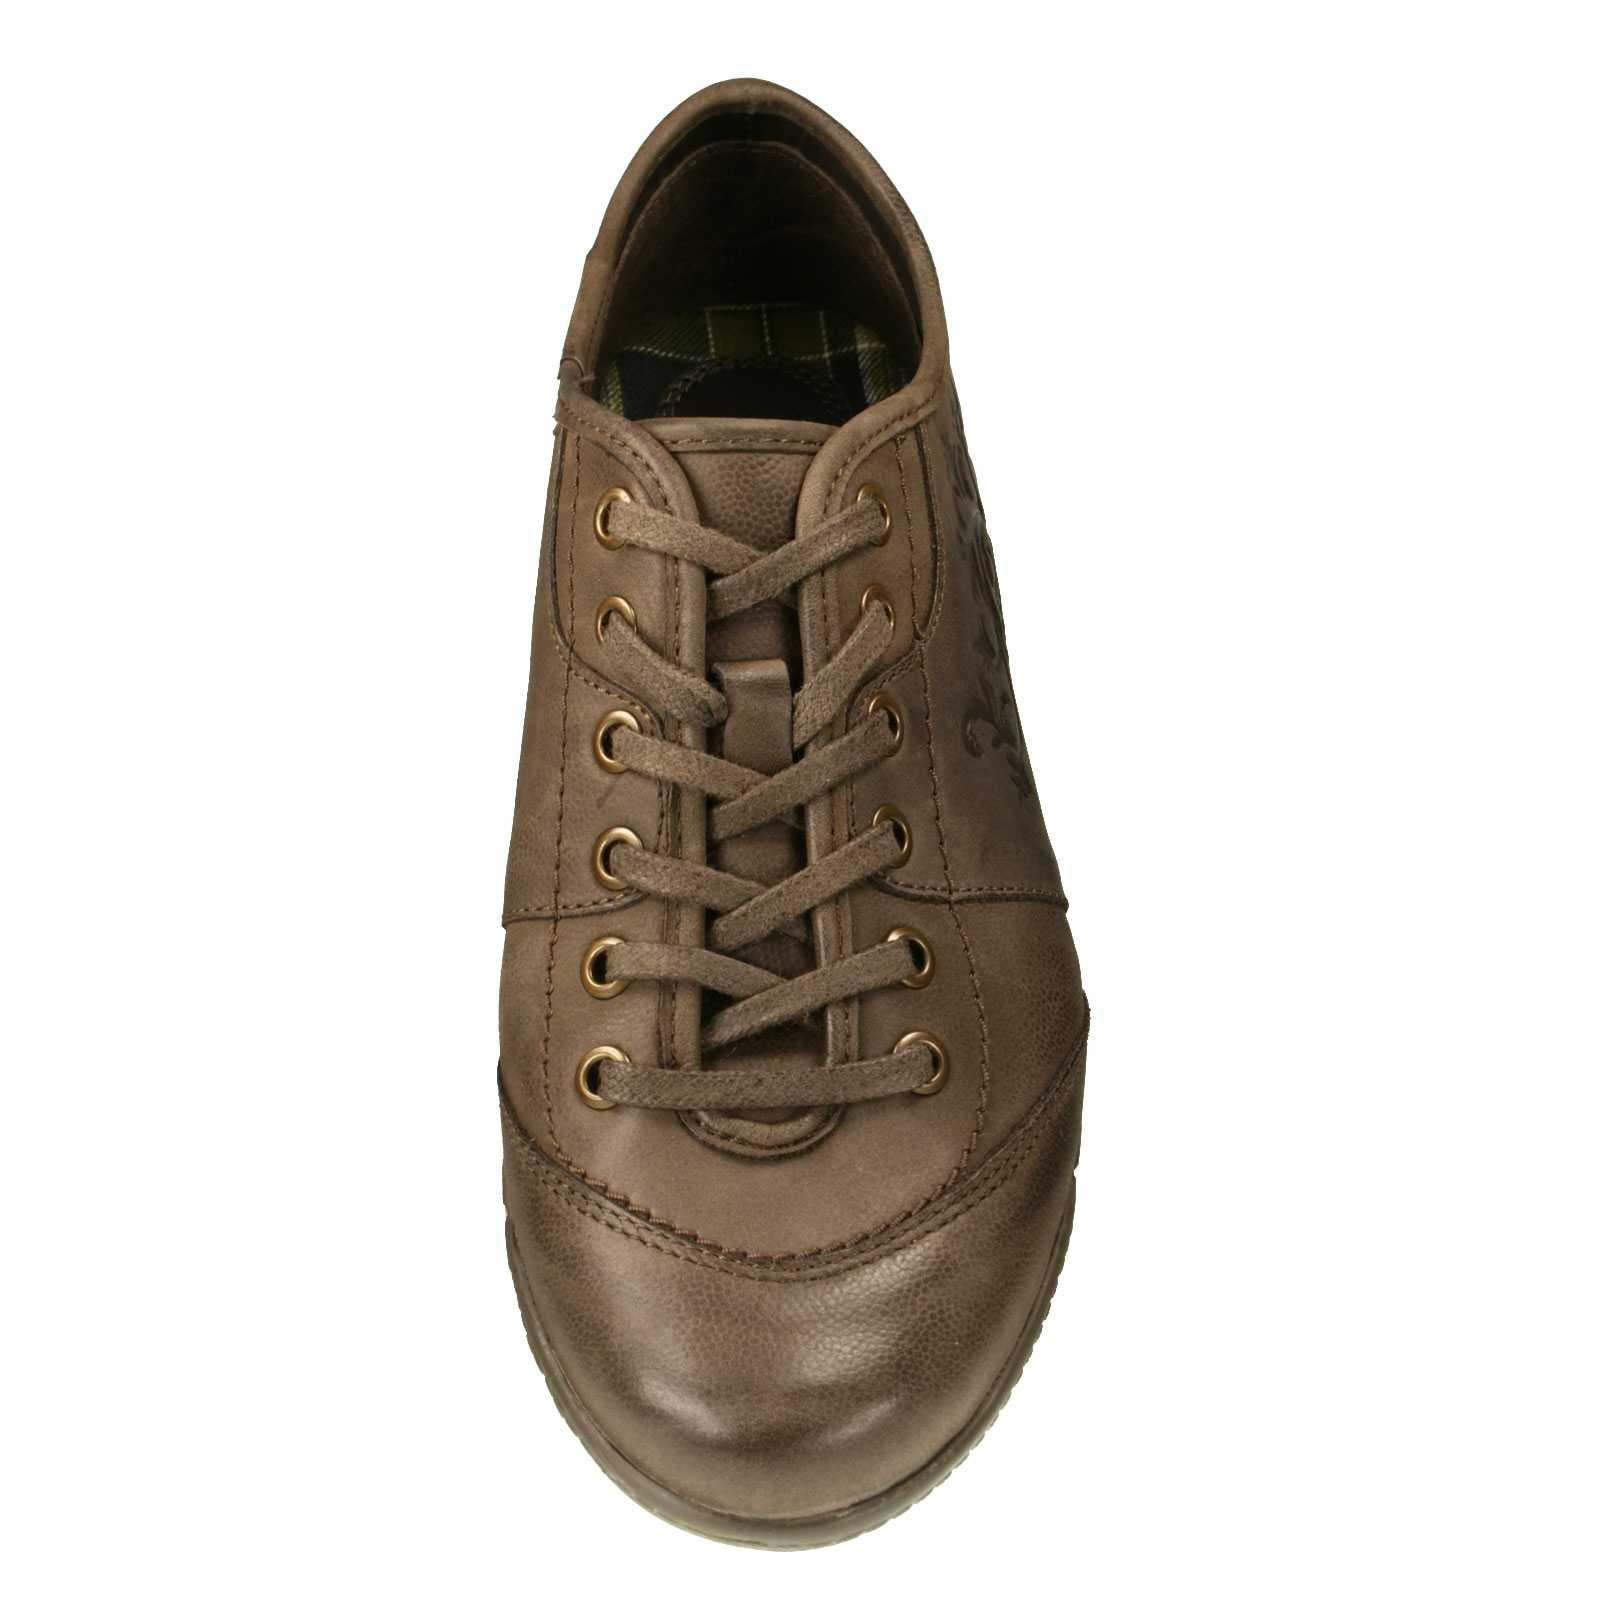 Bugatti Shoes Braun Rihanna J0511 5s 667 Schuhparadies